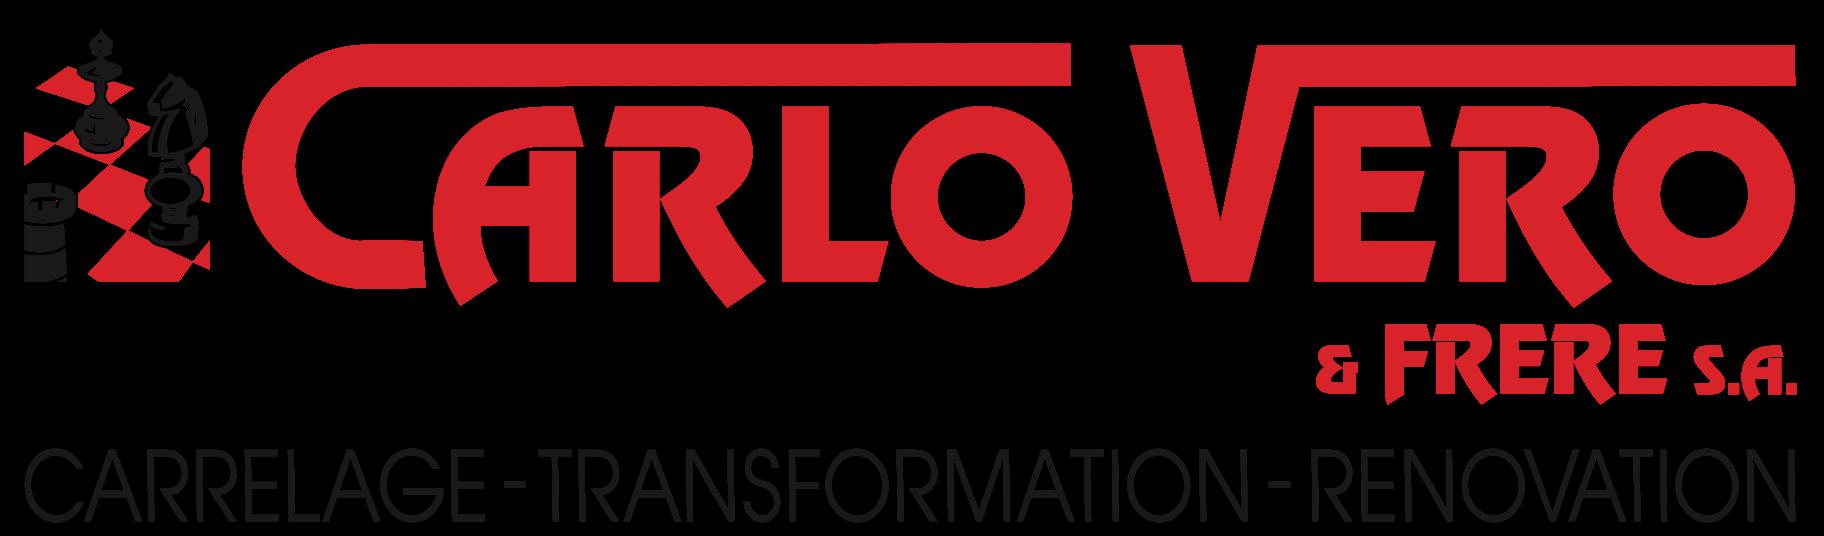 Carlo Vero & Frère SA